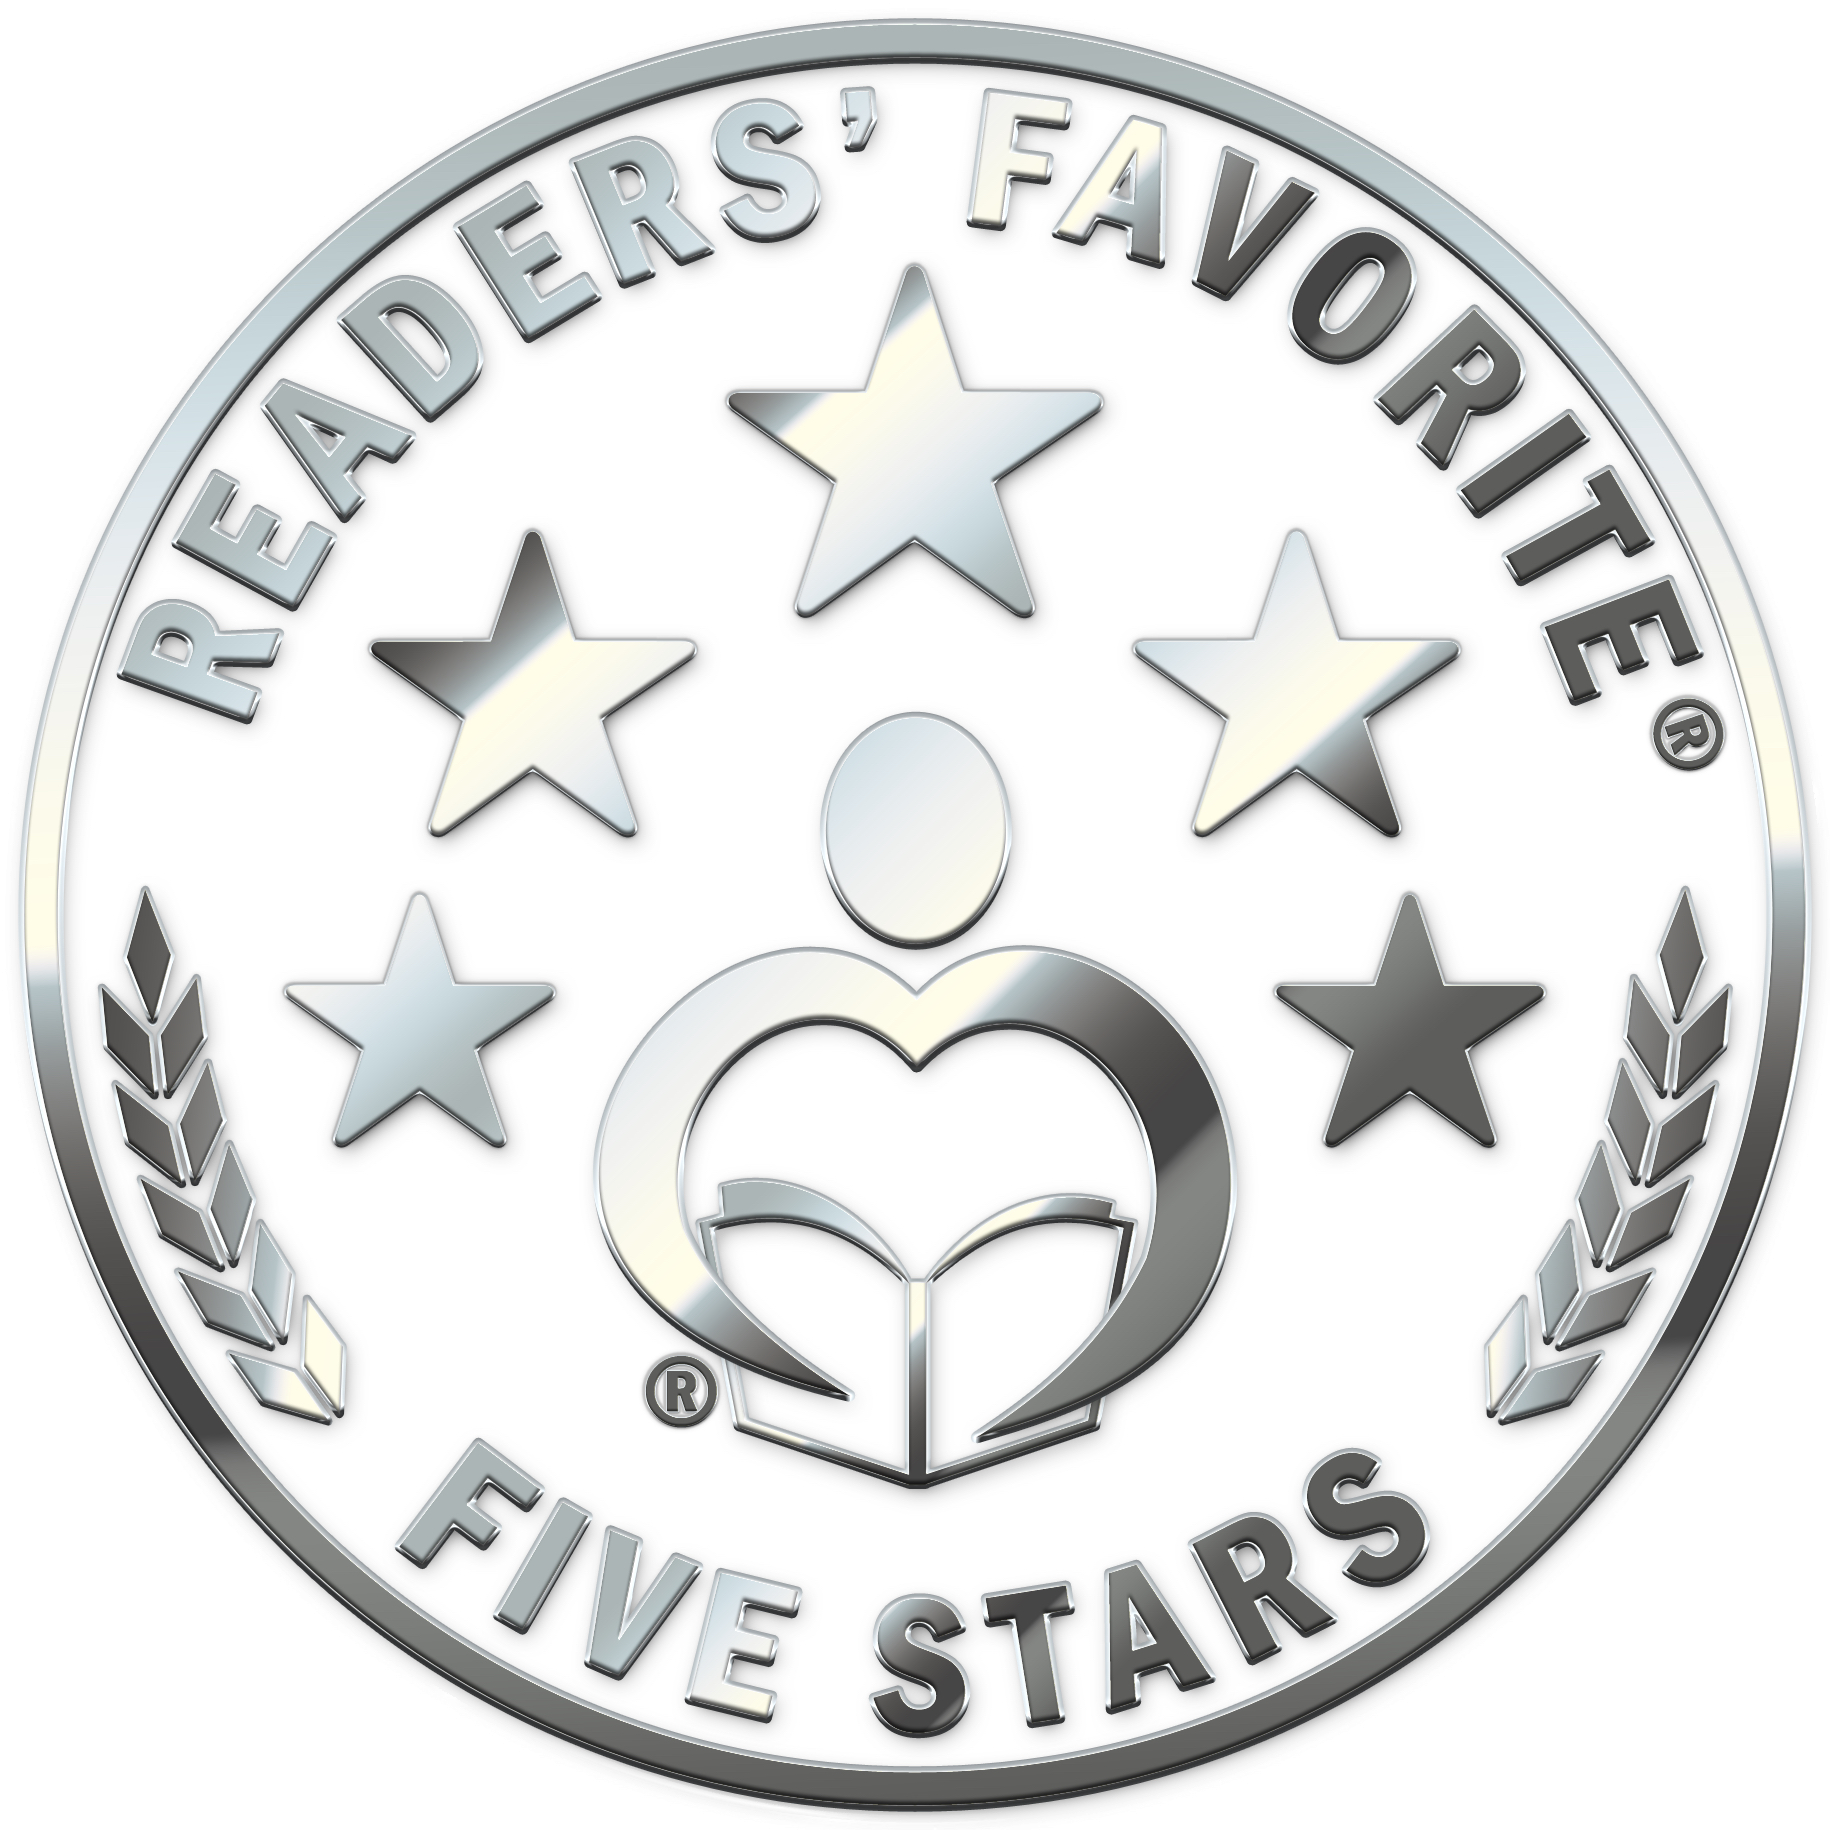 Readers' Favorite 5 star logo